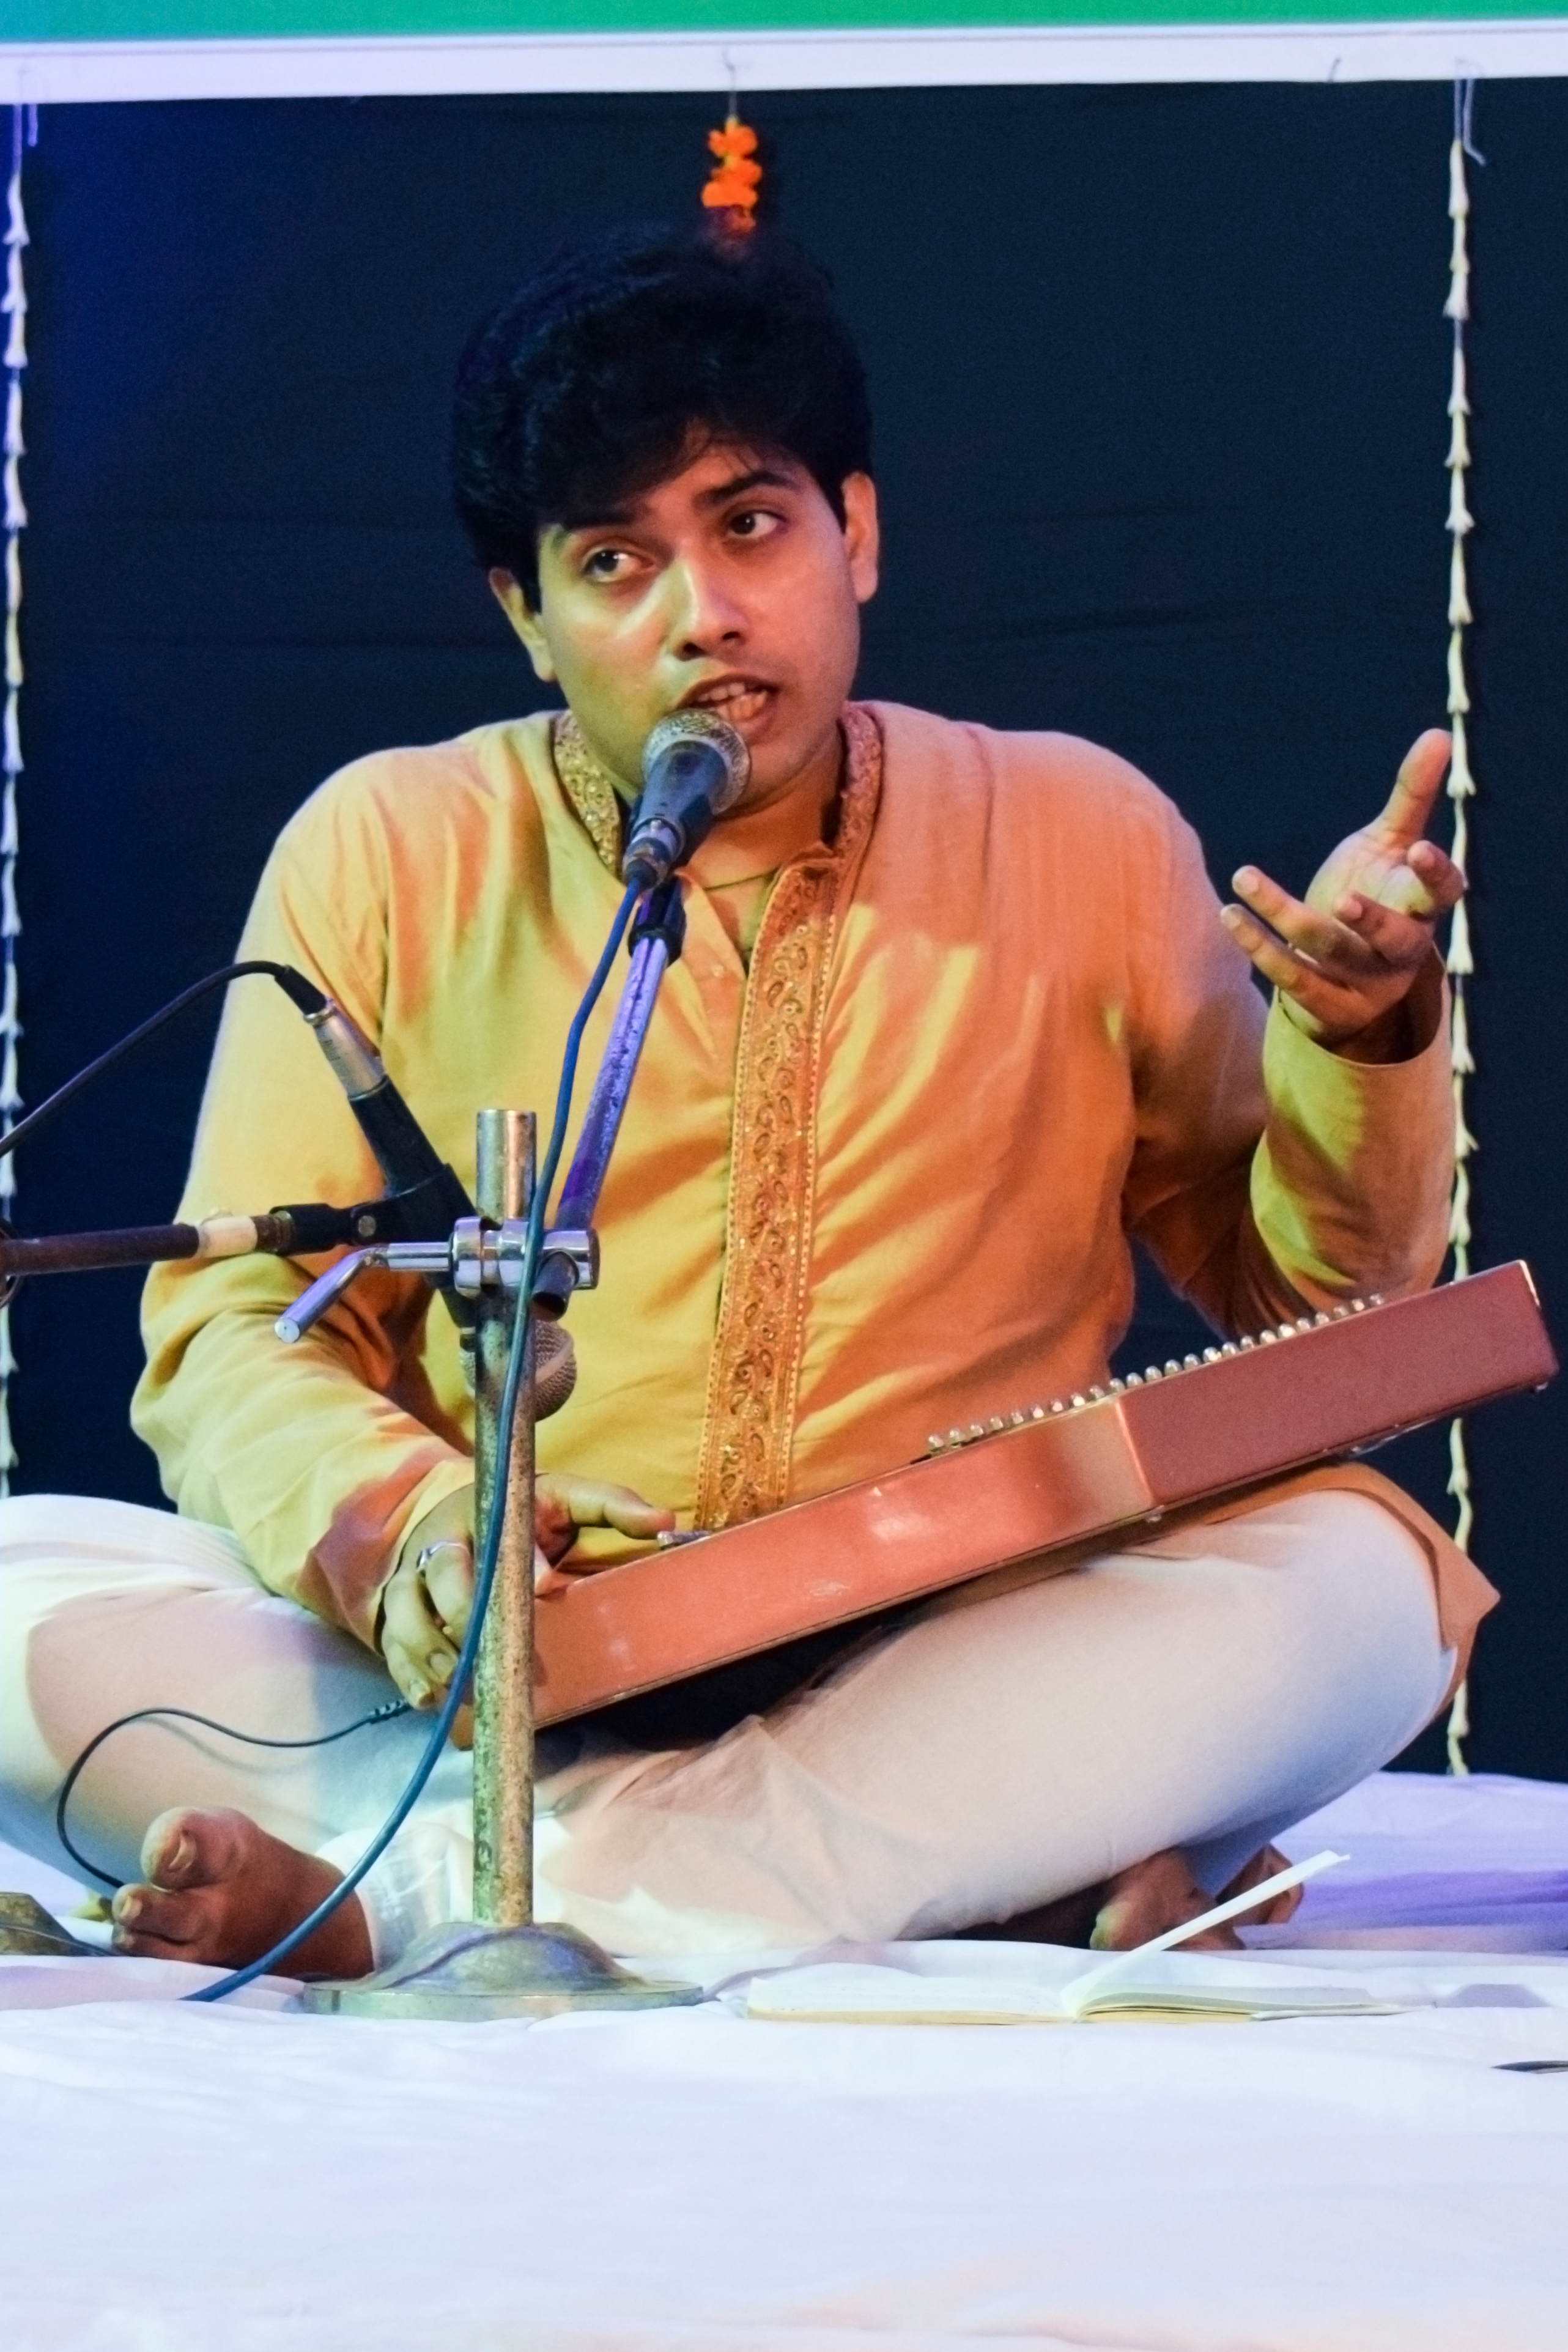 Amit Kumar Rath